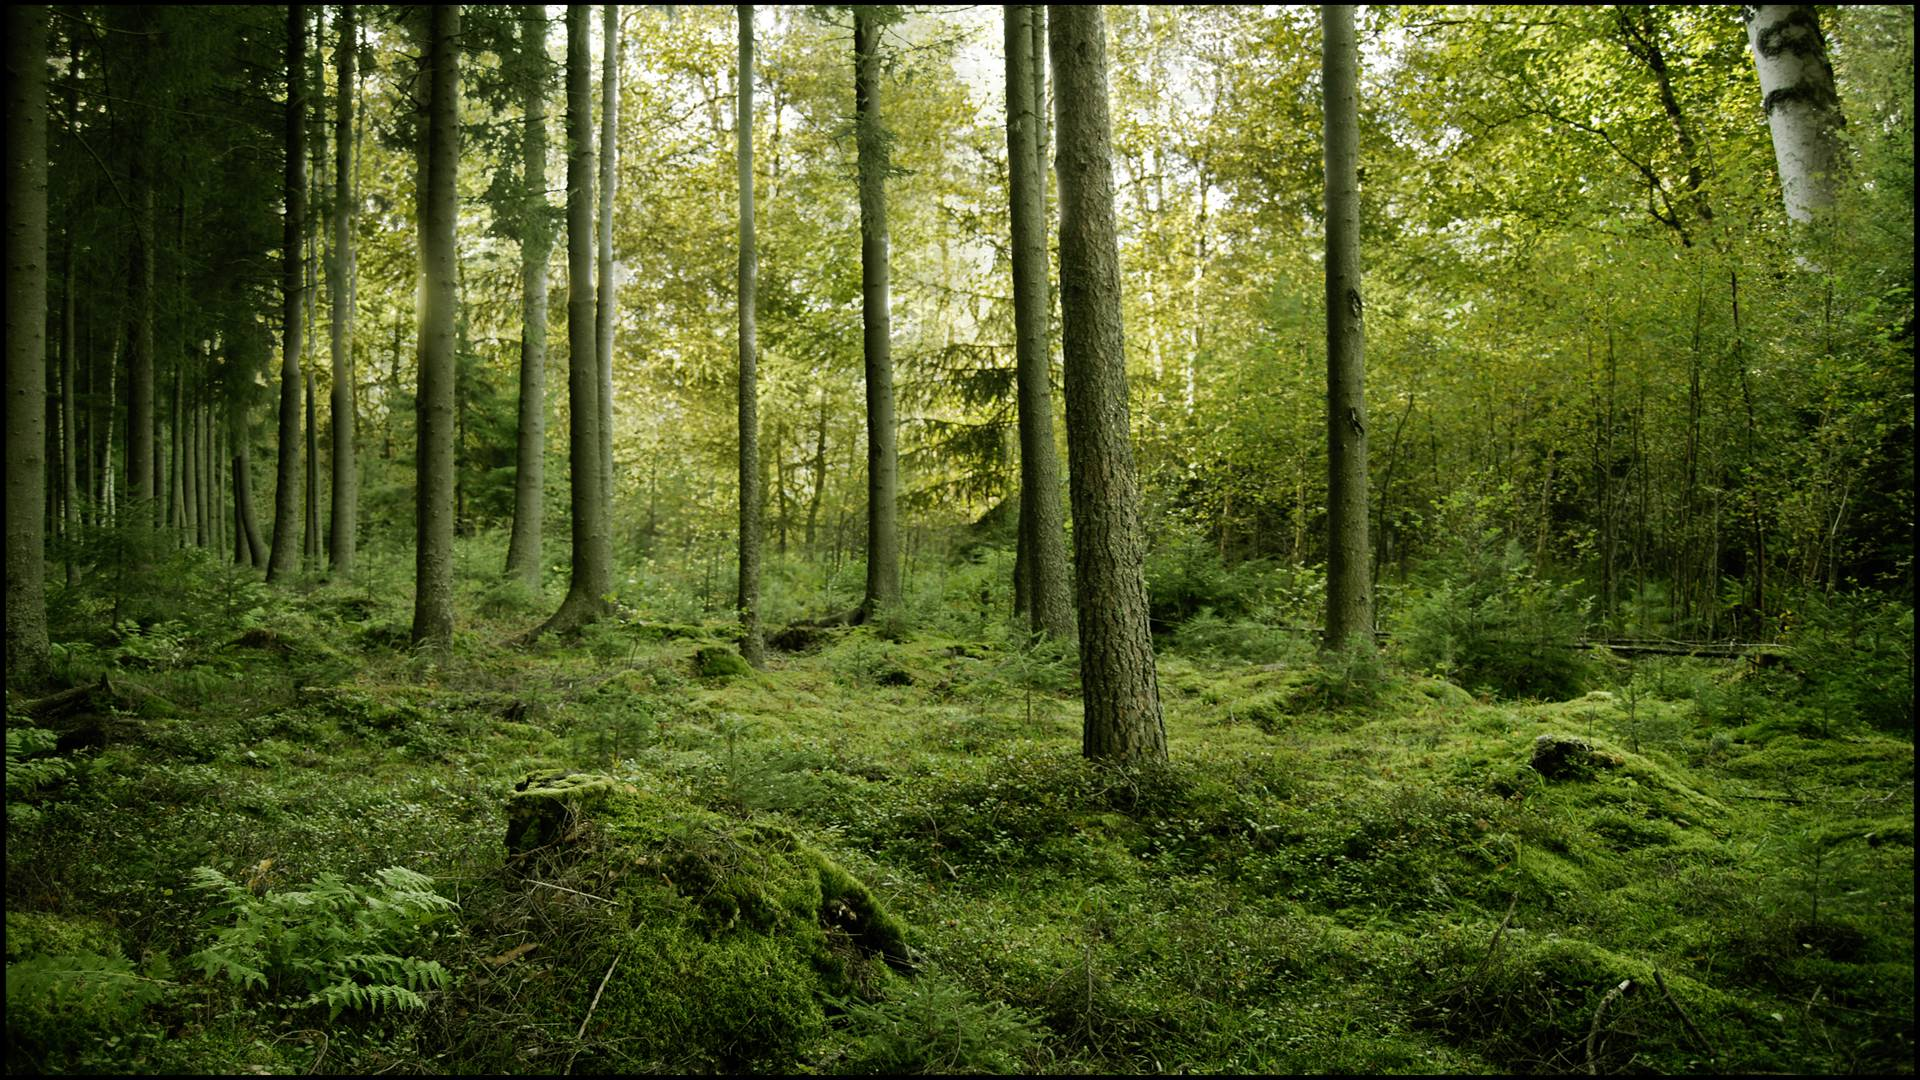 nature-trees-forest-wallpaper.jpg